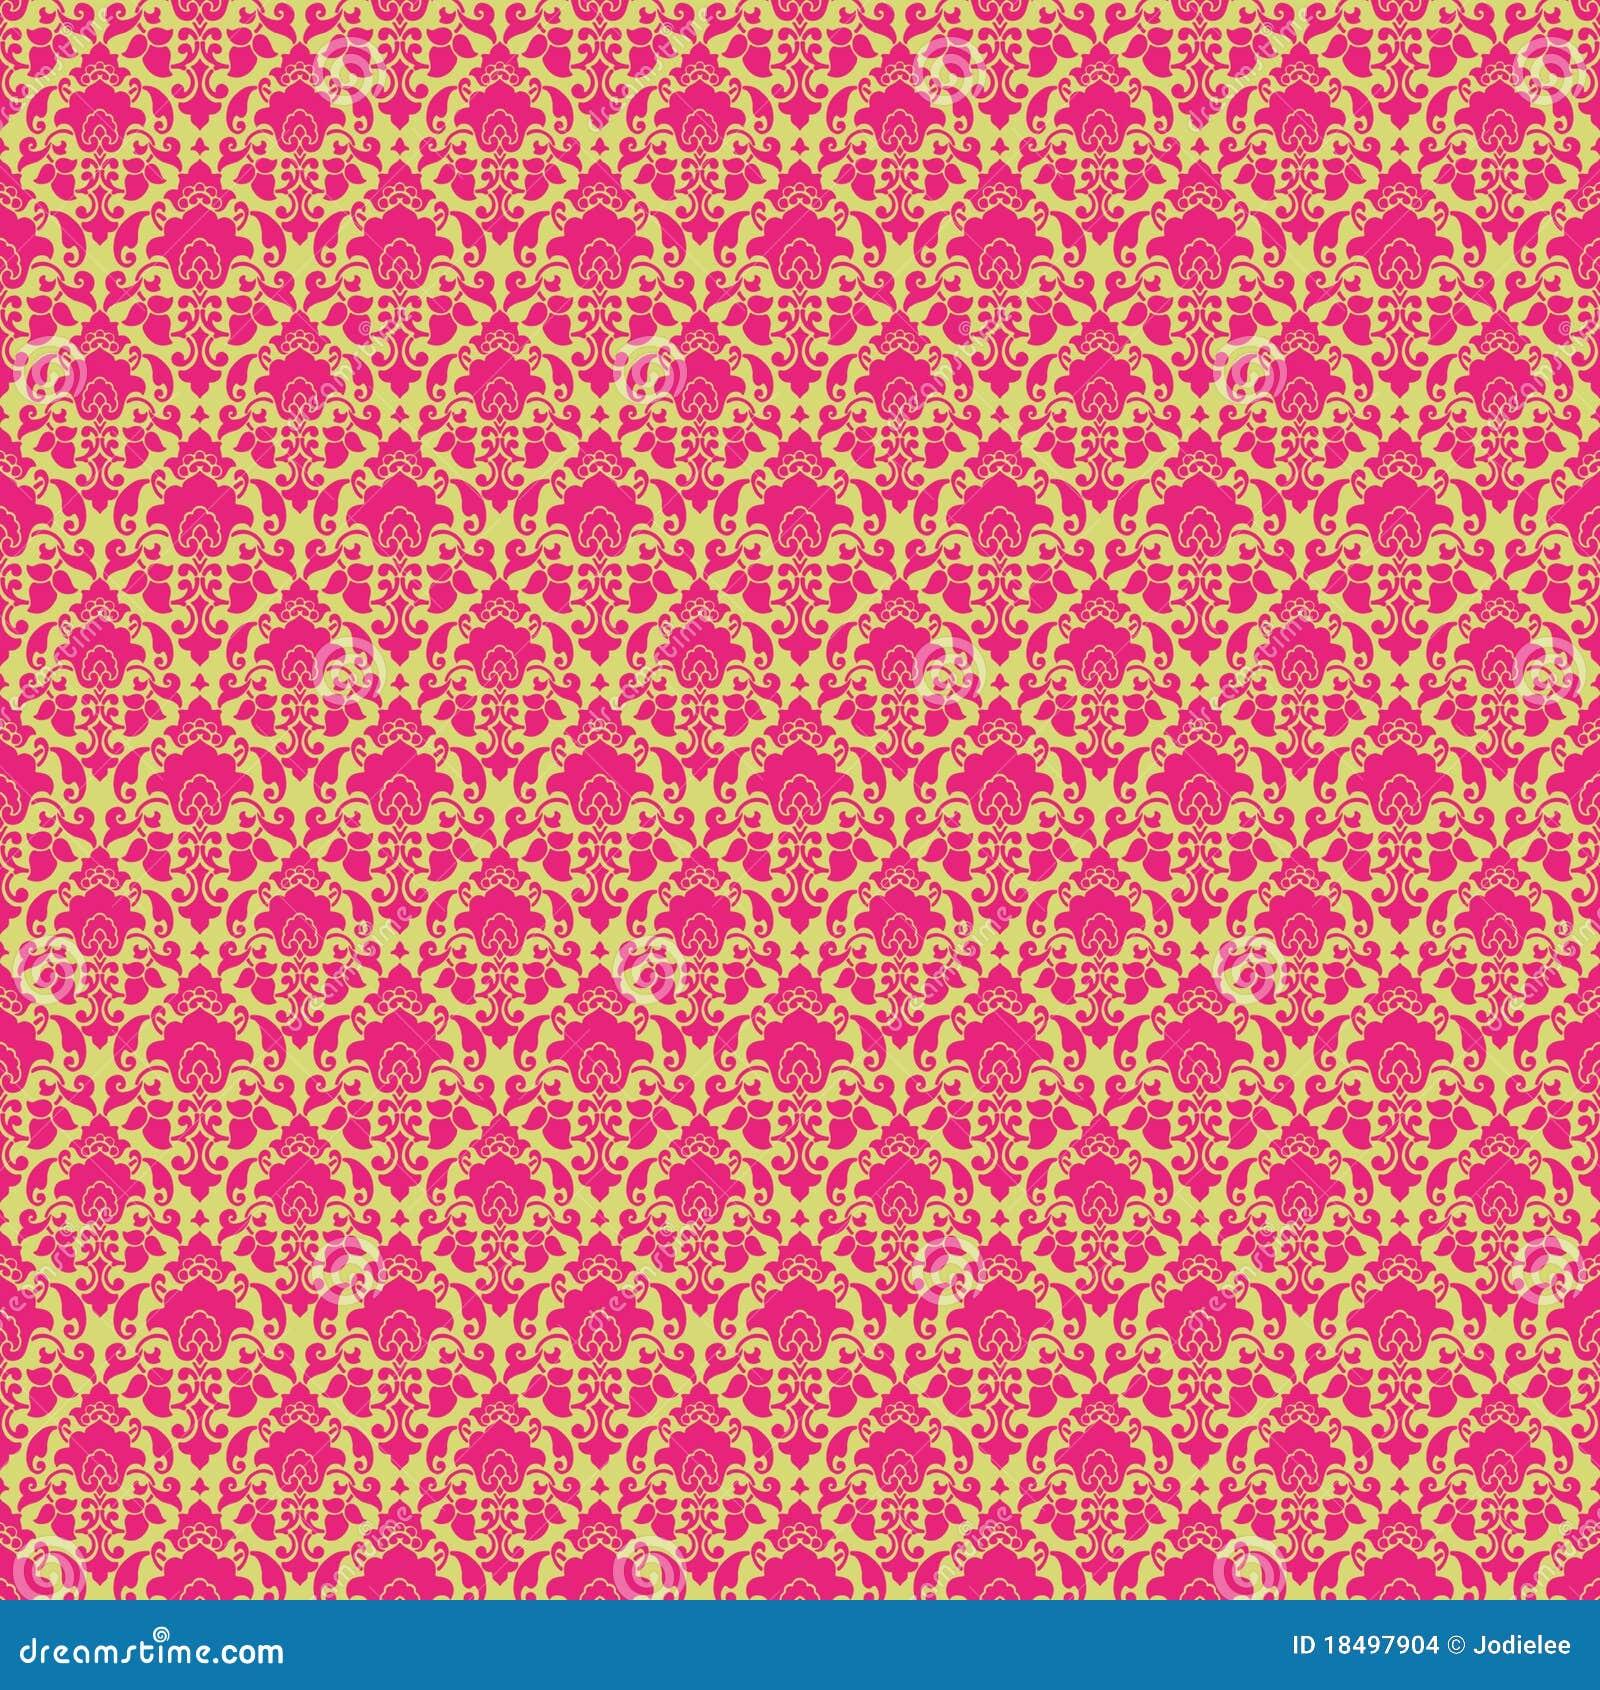 hot pink paisley background - photo #18